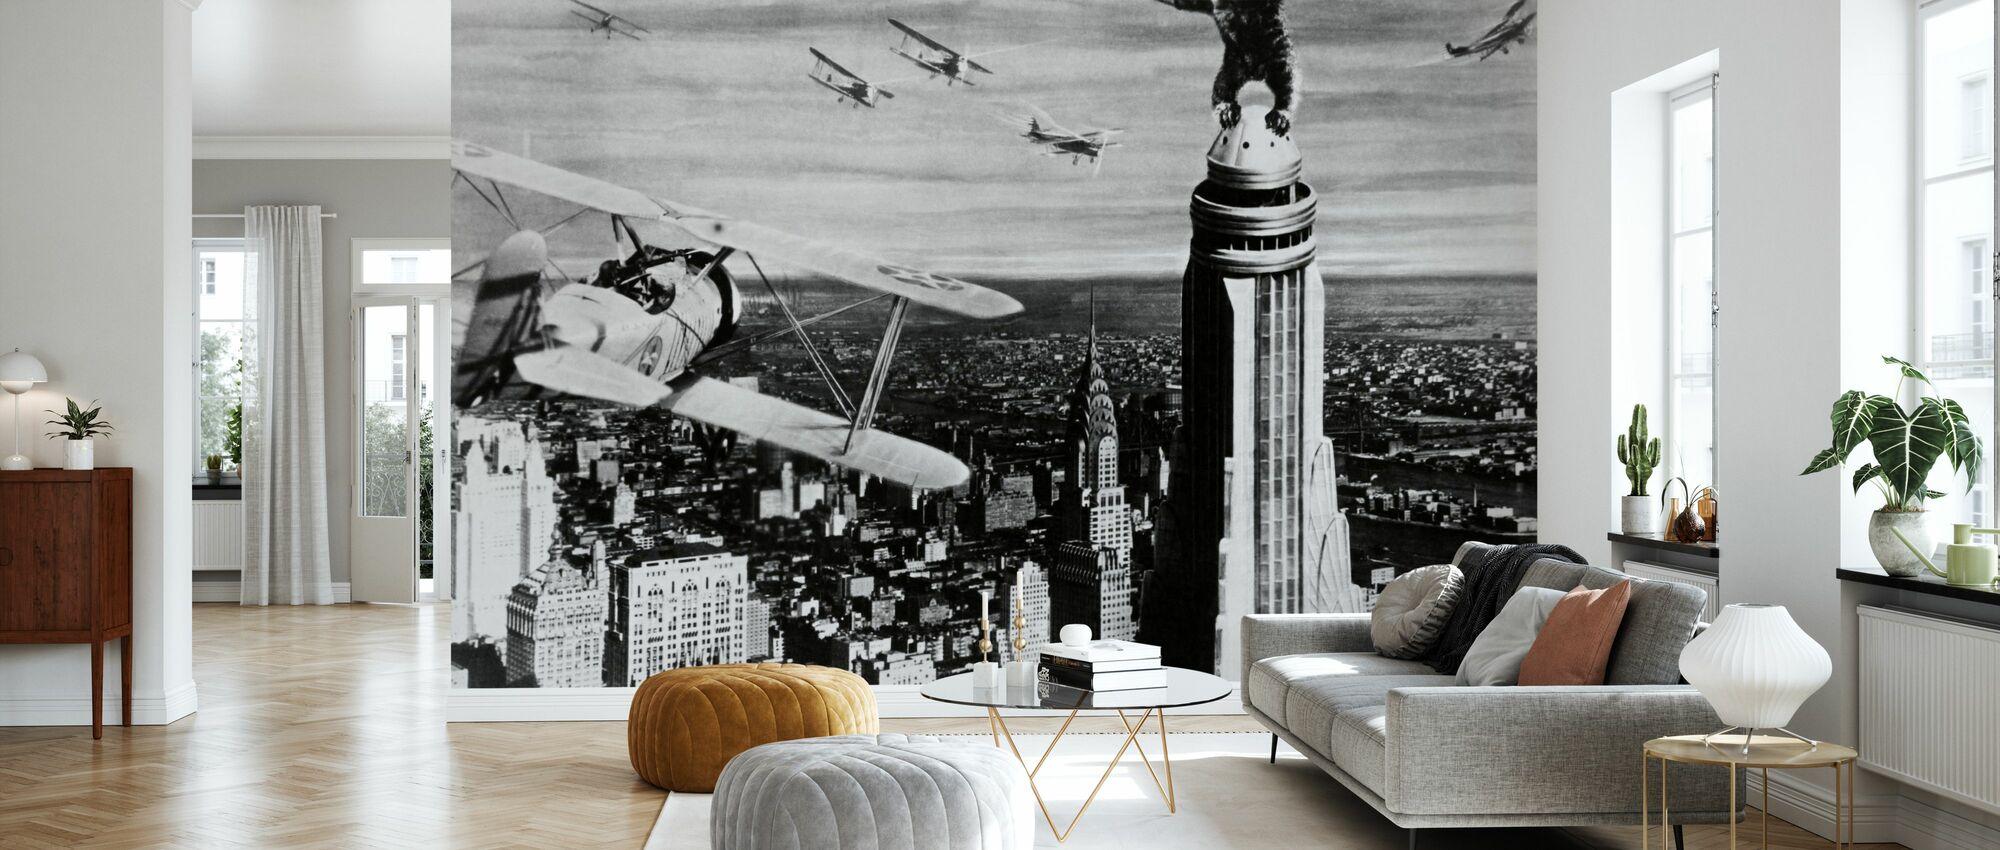 King Kong - Wallpaper - Living Room